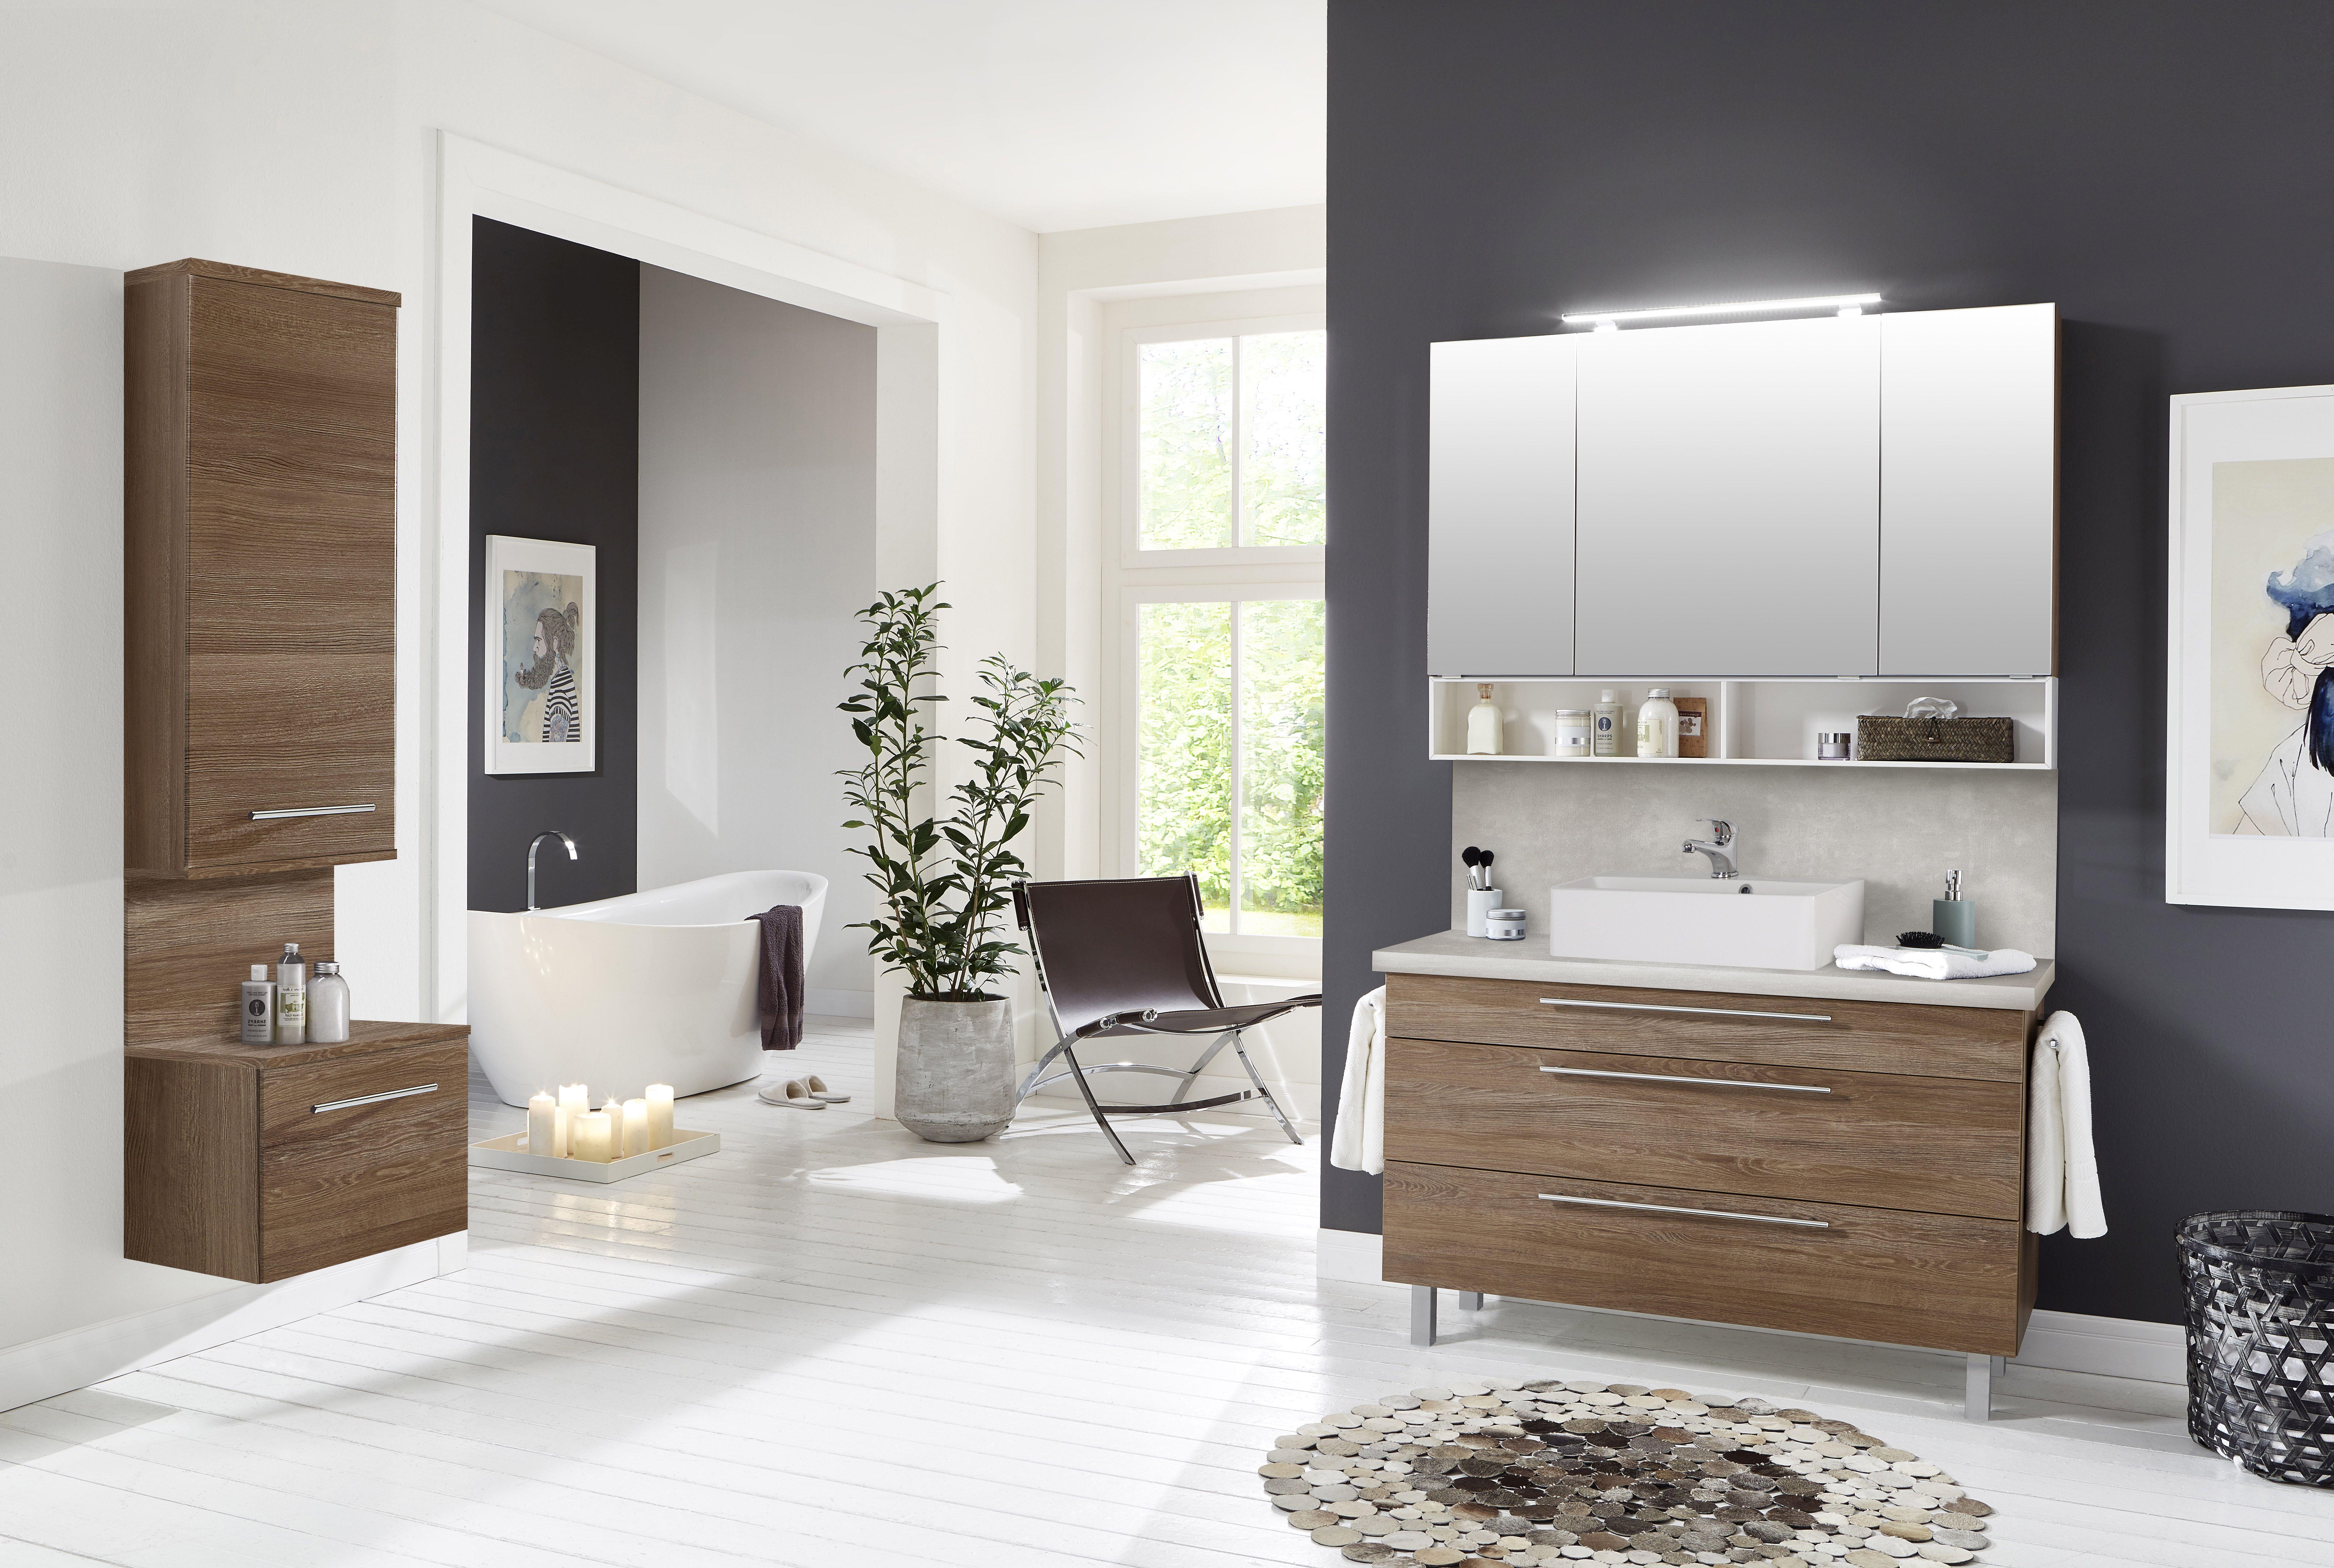 marlin bad 3110 spiegelschrank 120 cm breit stoc12. Black Bedroom Furniture Sets. Home Design Ideas